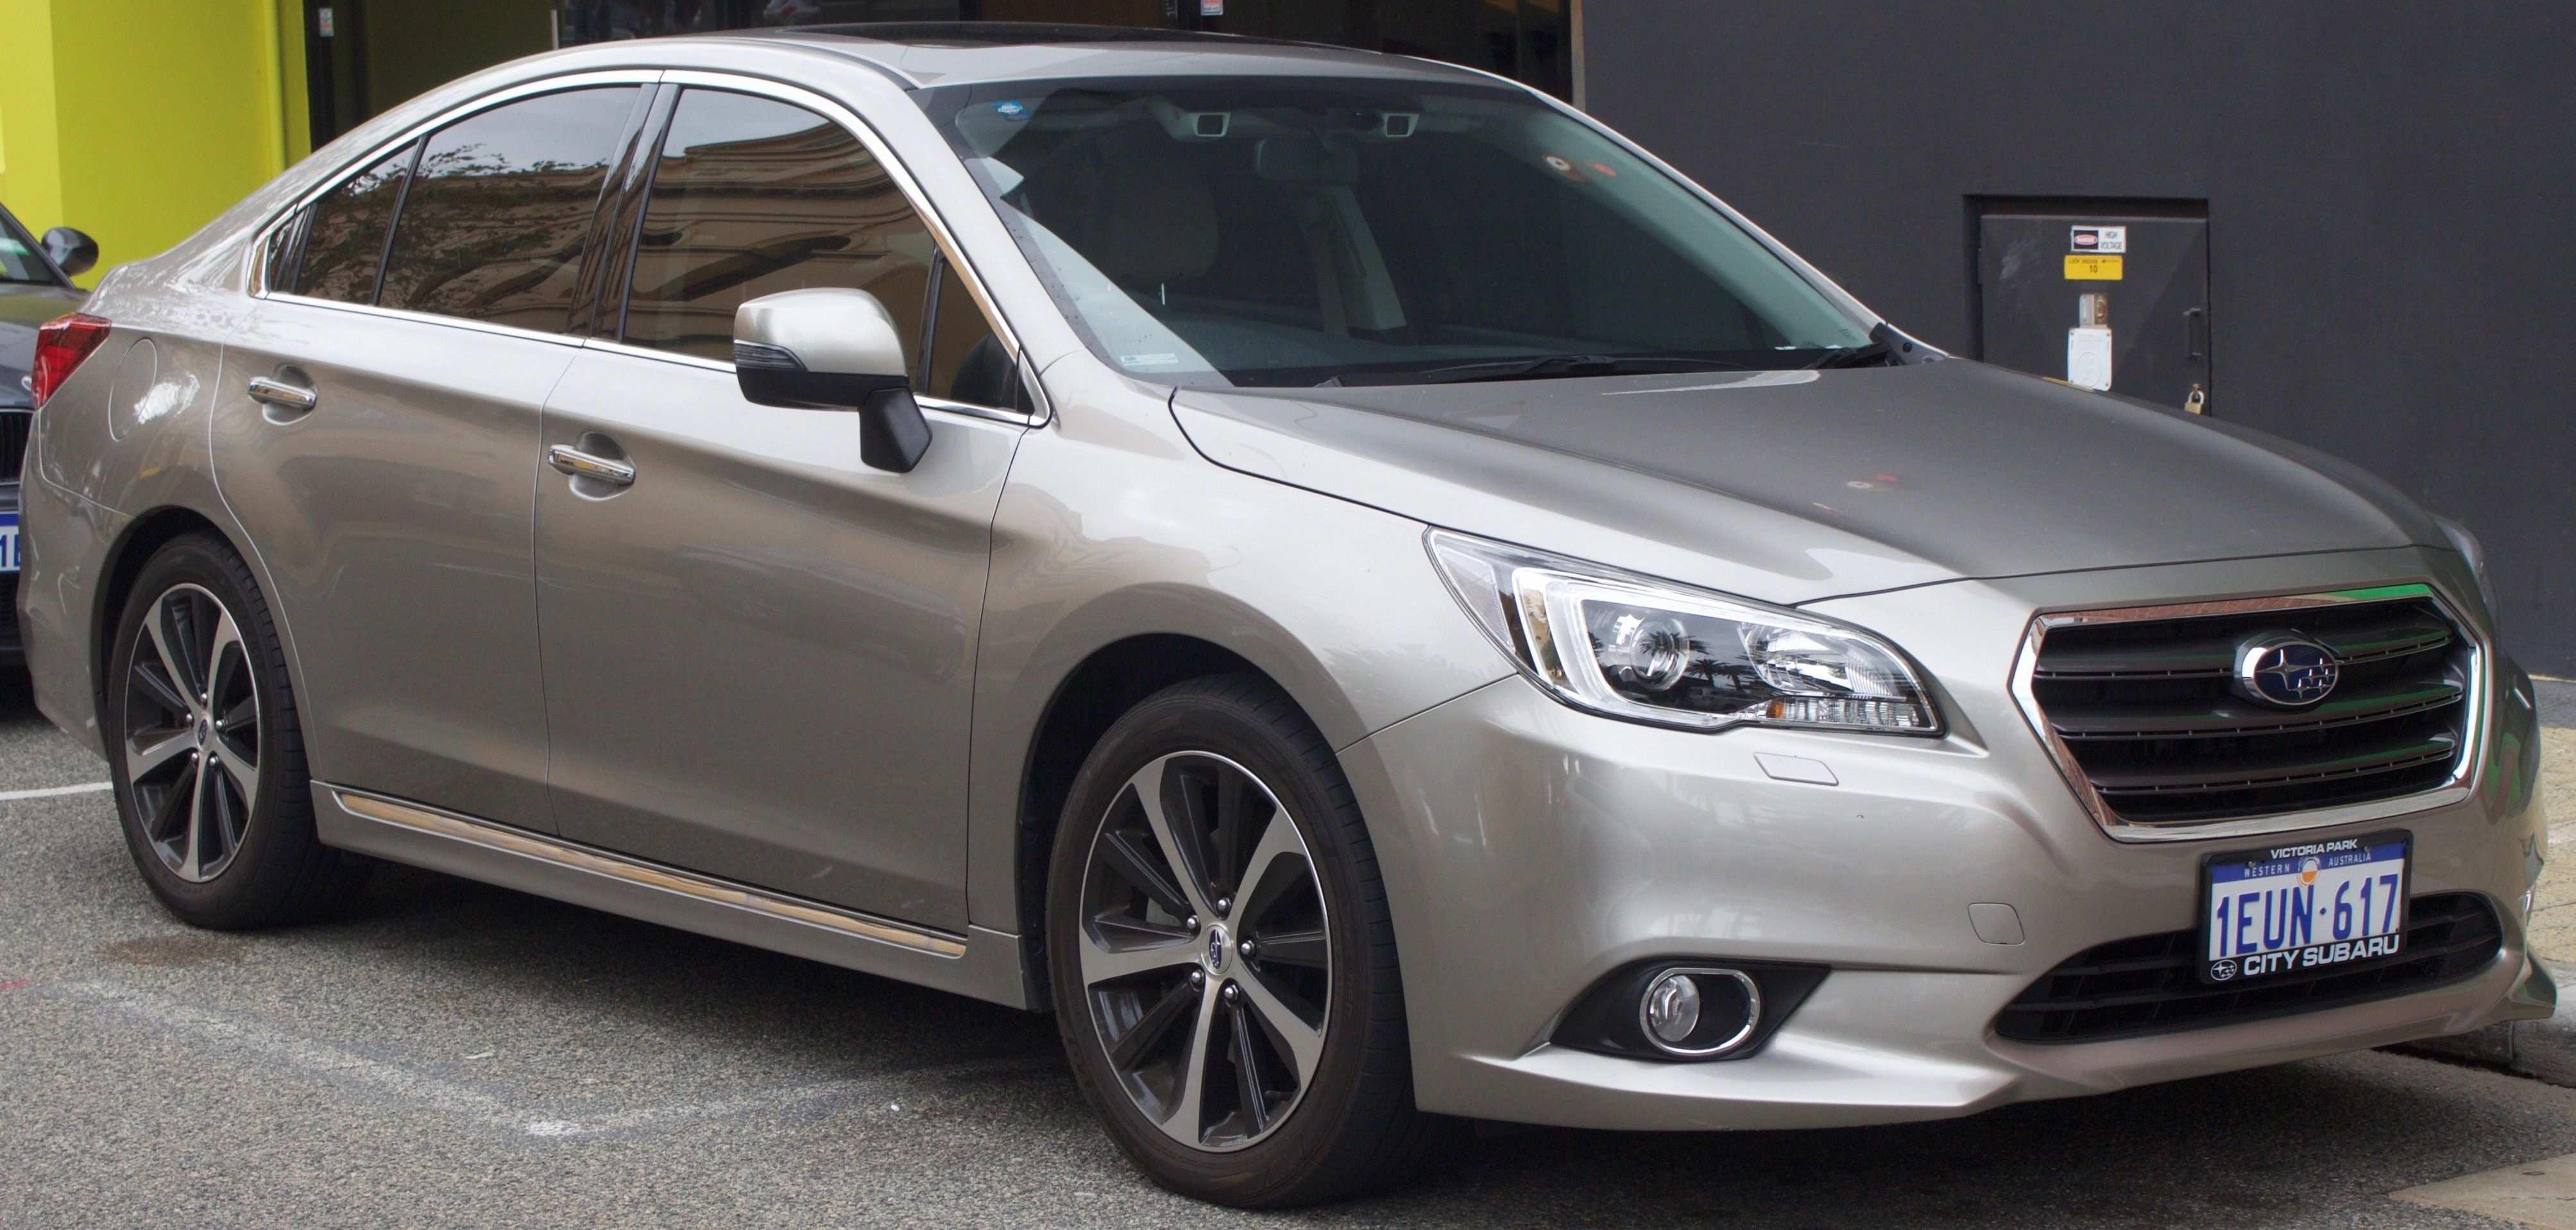 50 The Subaru 2020 Mexico Redesign and Concept by Subaru 2020 Mexico